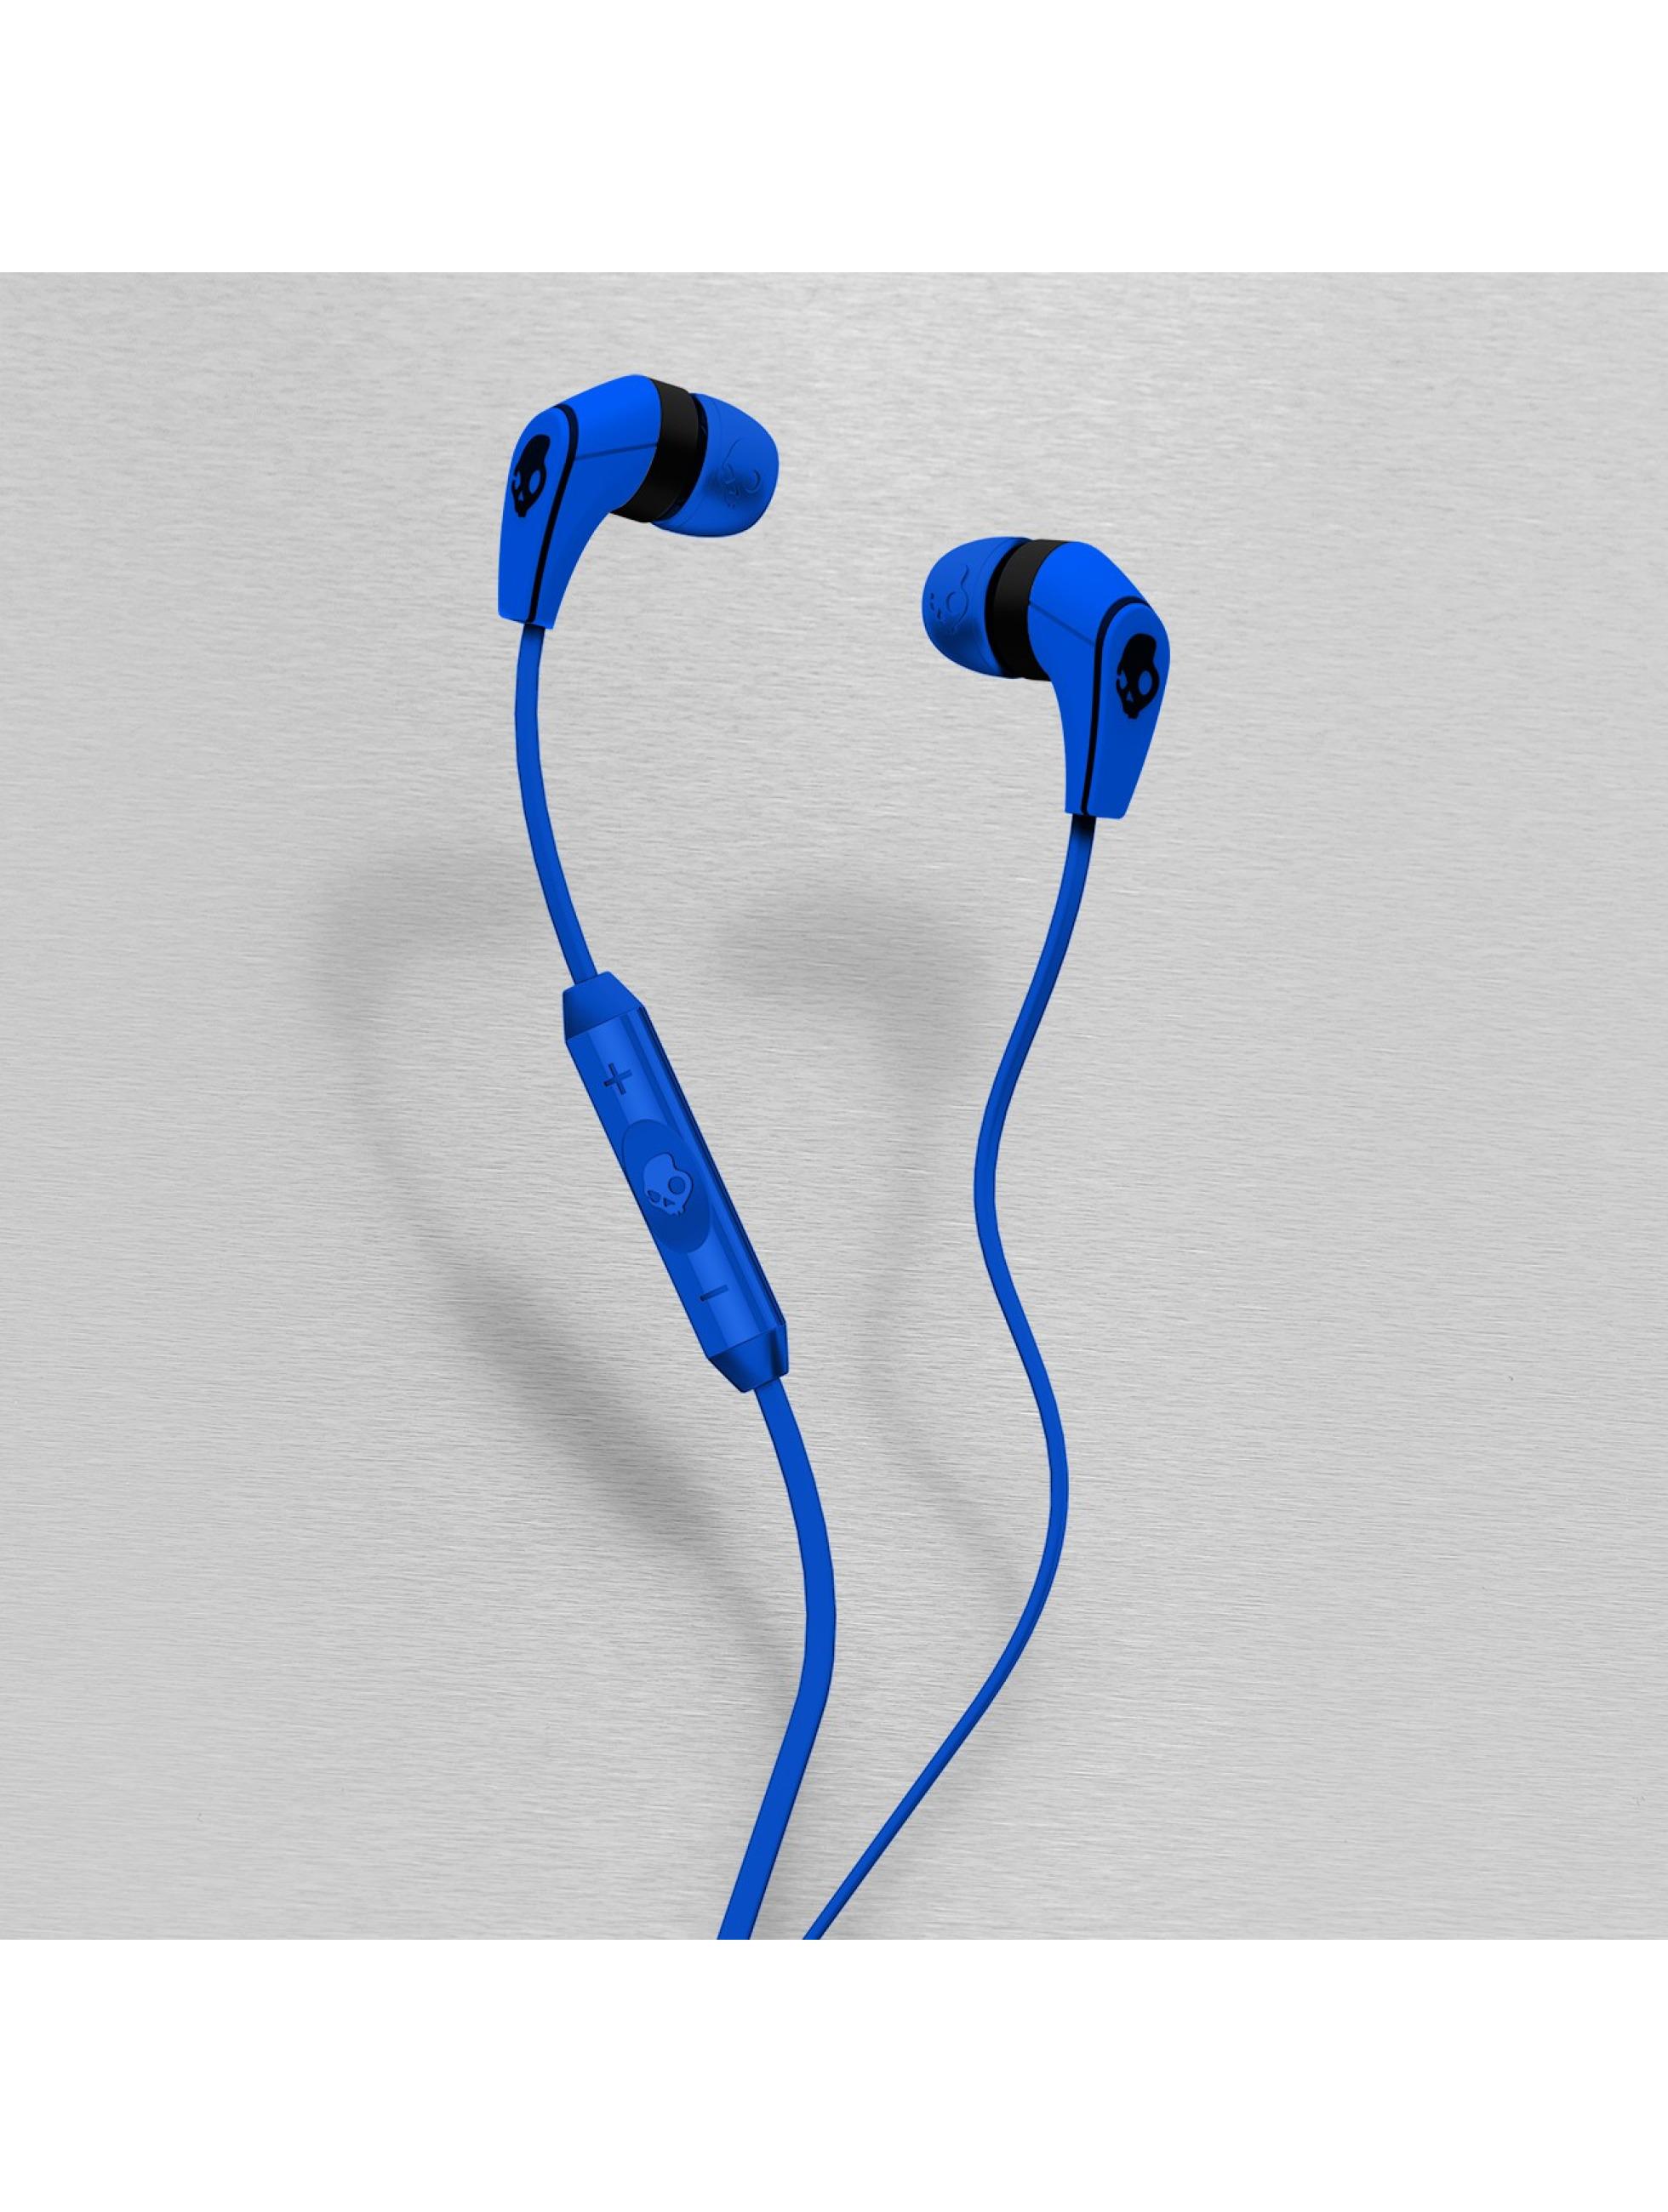 Skullcandy Kopfhörer 50/50 Mic3 blau